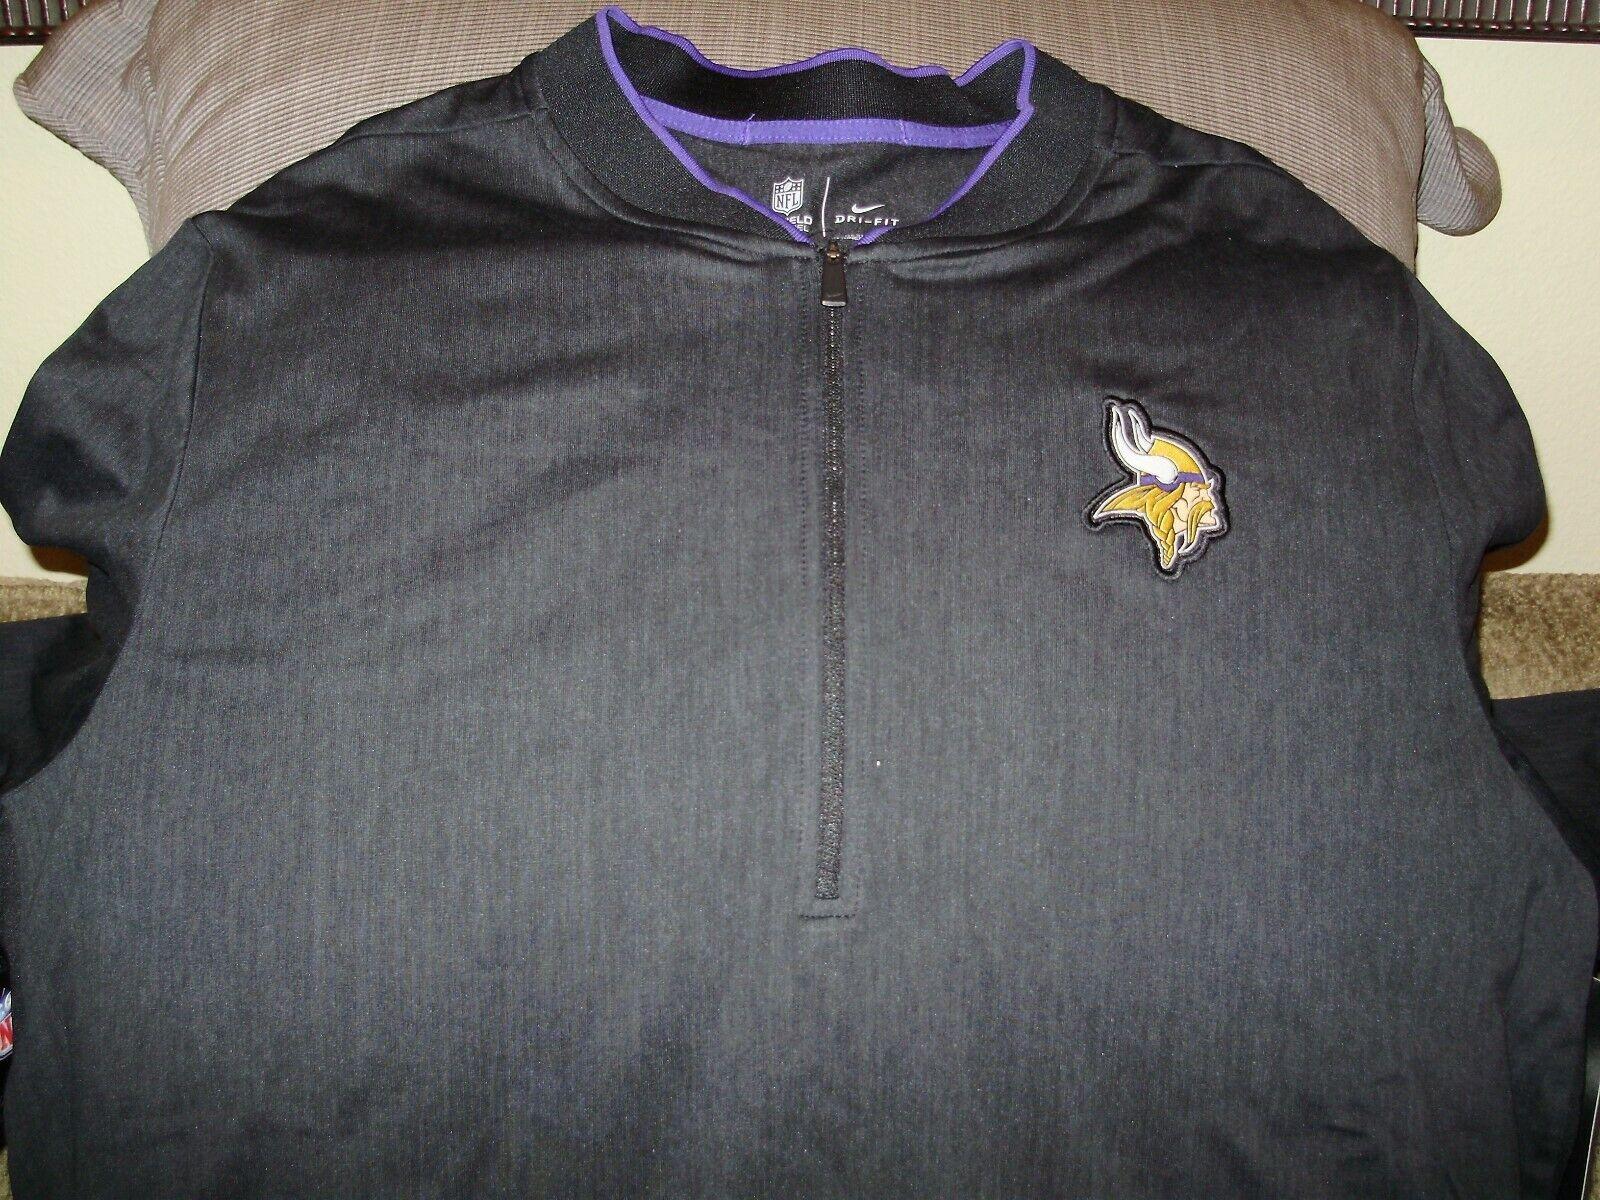 b368bdf0 NFL Minnesota Vikings Nike Dri-fit Black Coaches 1/2 Zip Golf Jacket ...